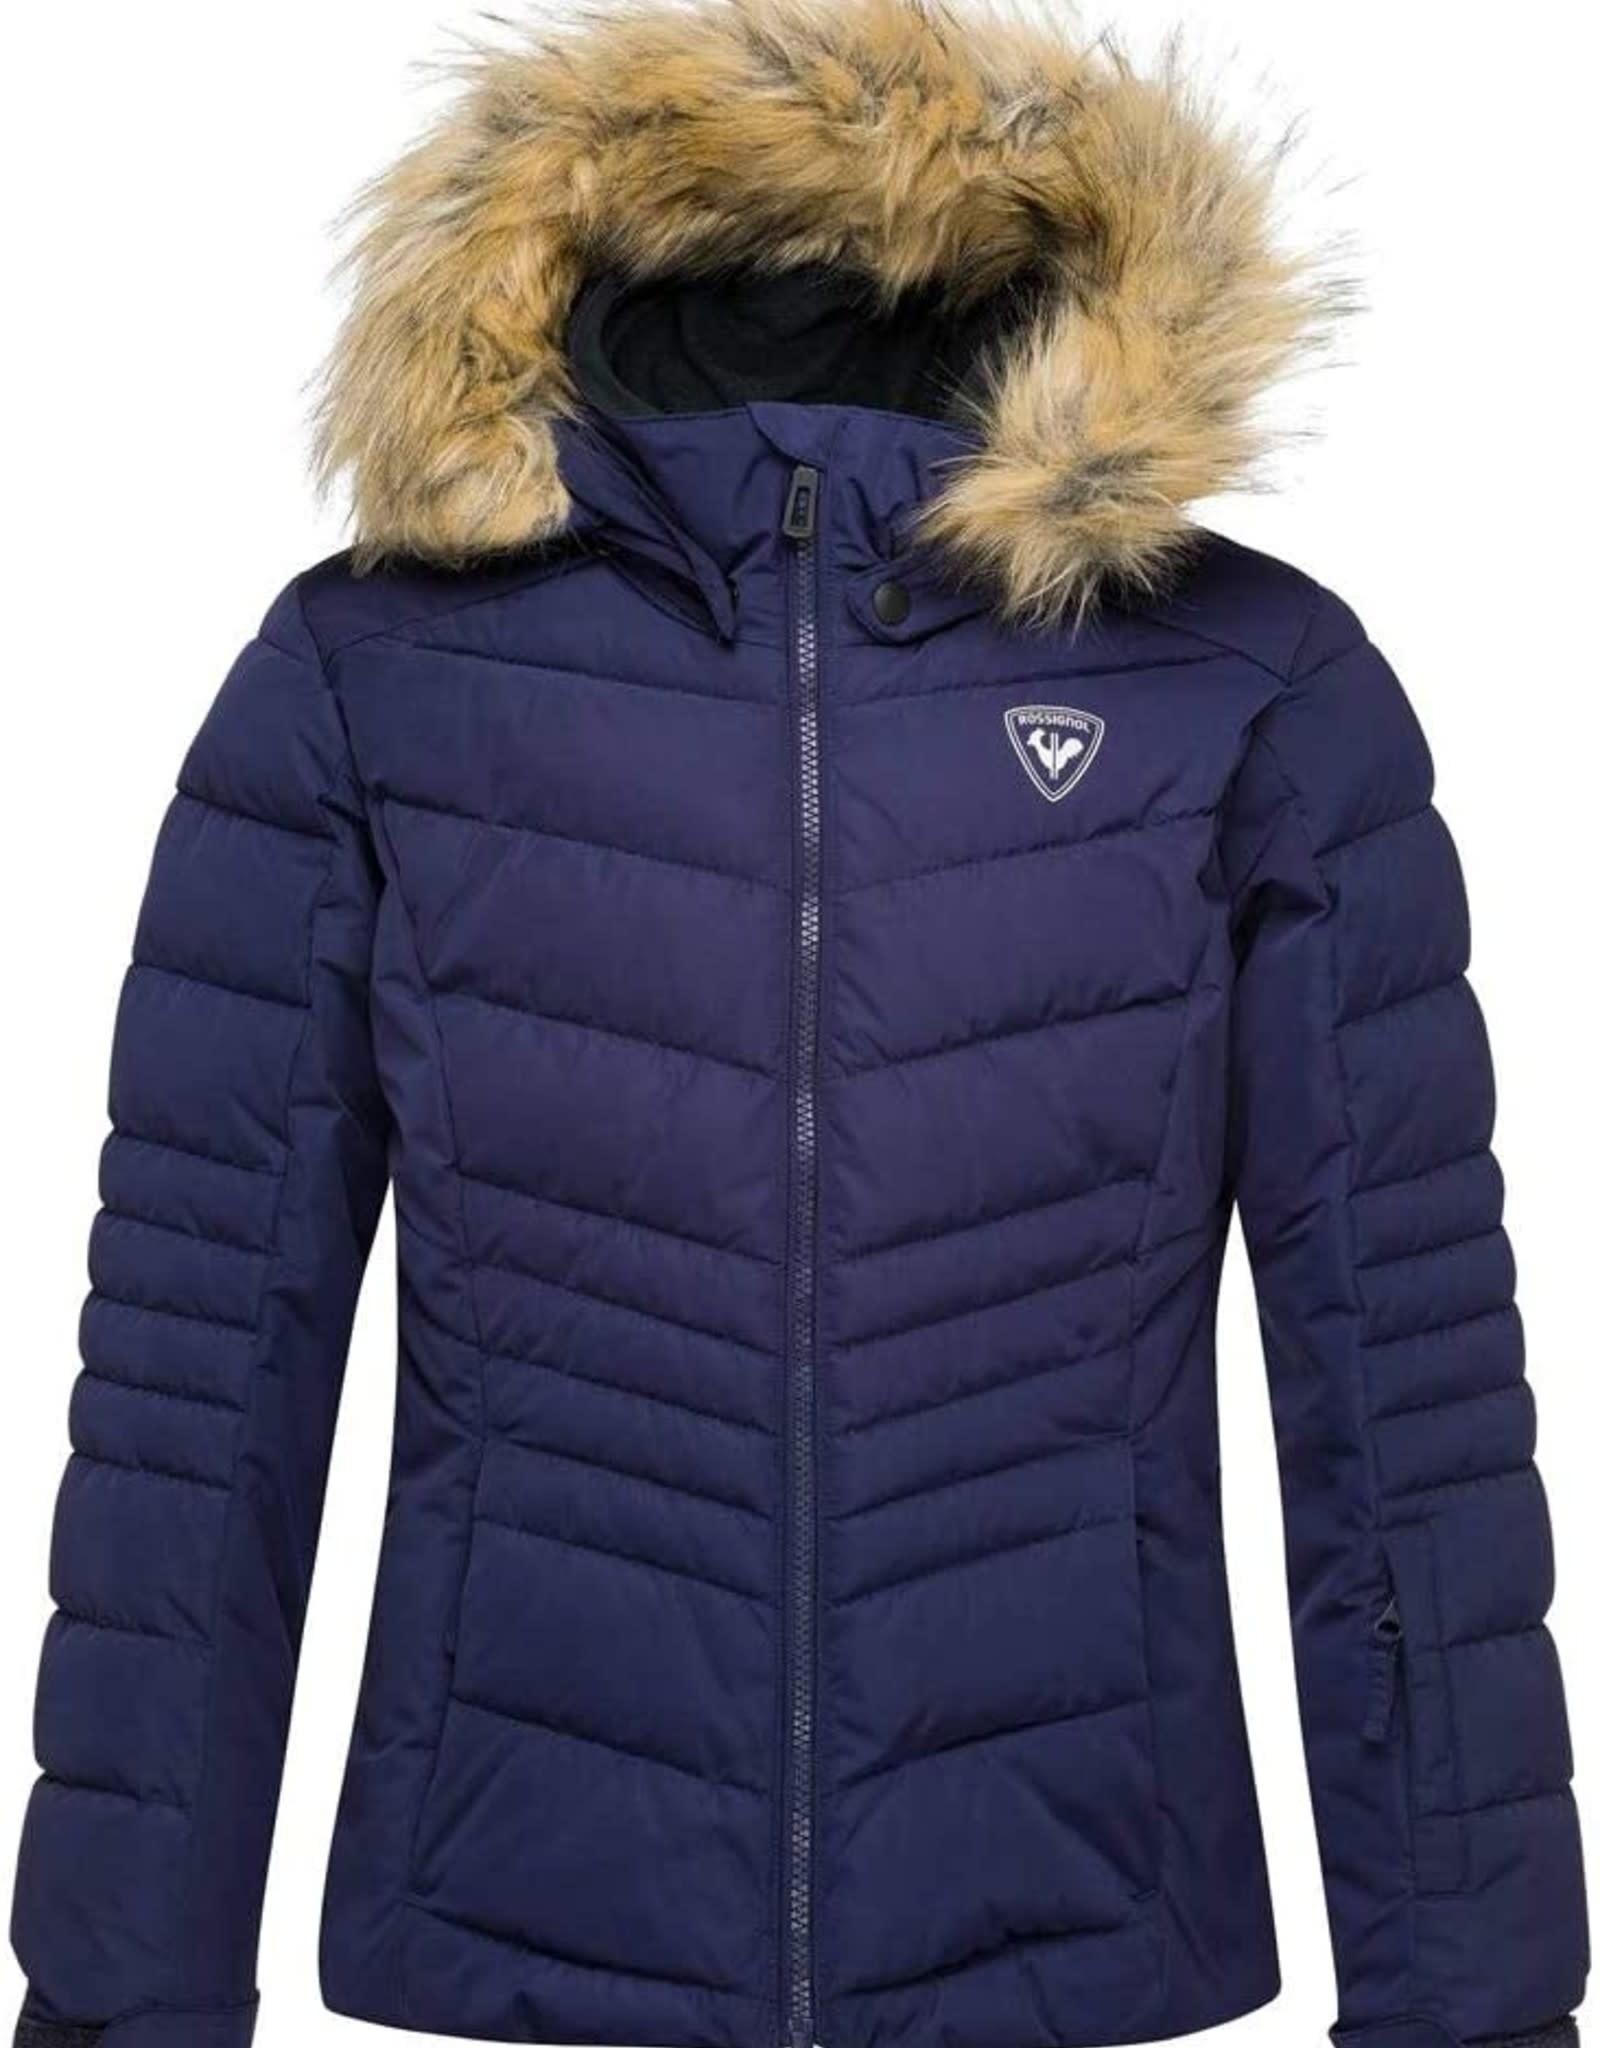 ROSSIGNOL Rossignol Pearly BB Polydown Ski Jacket 14